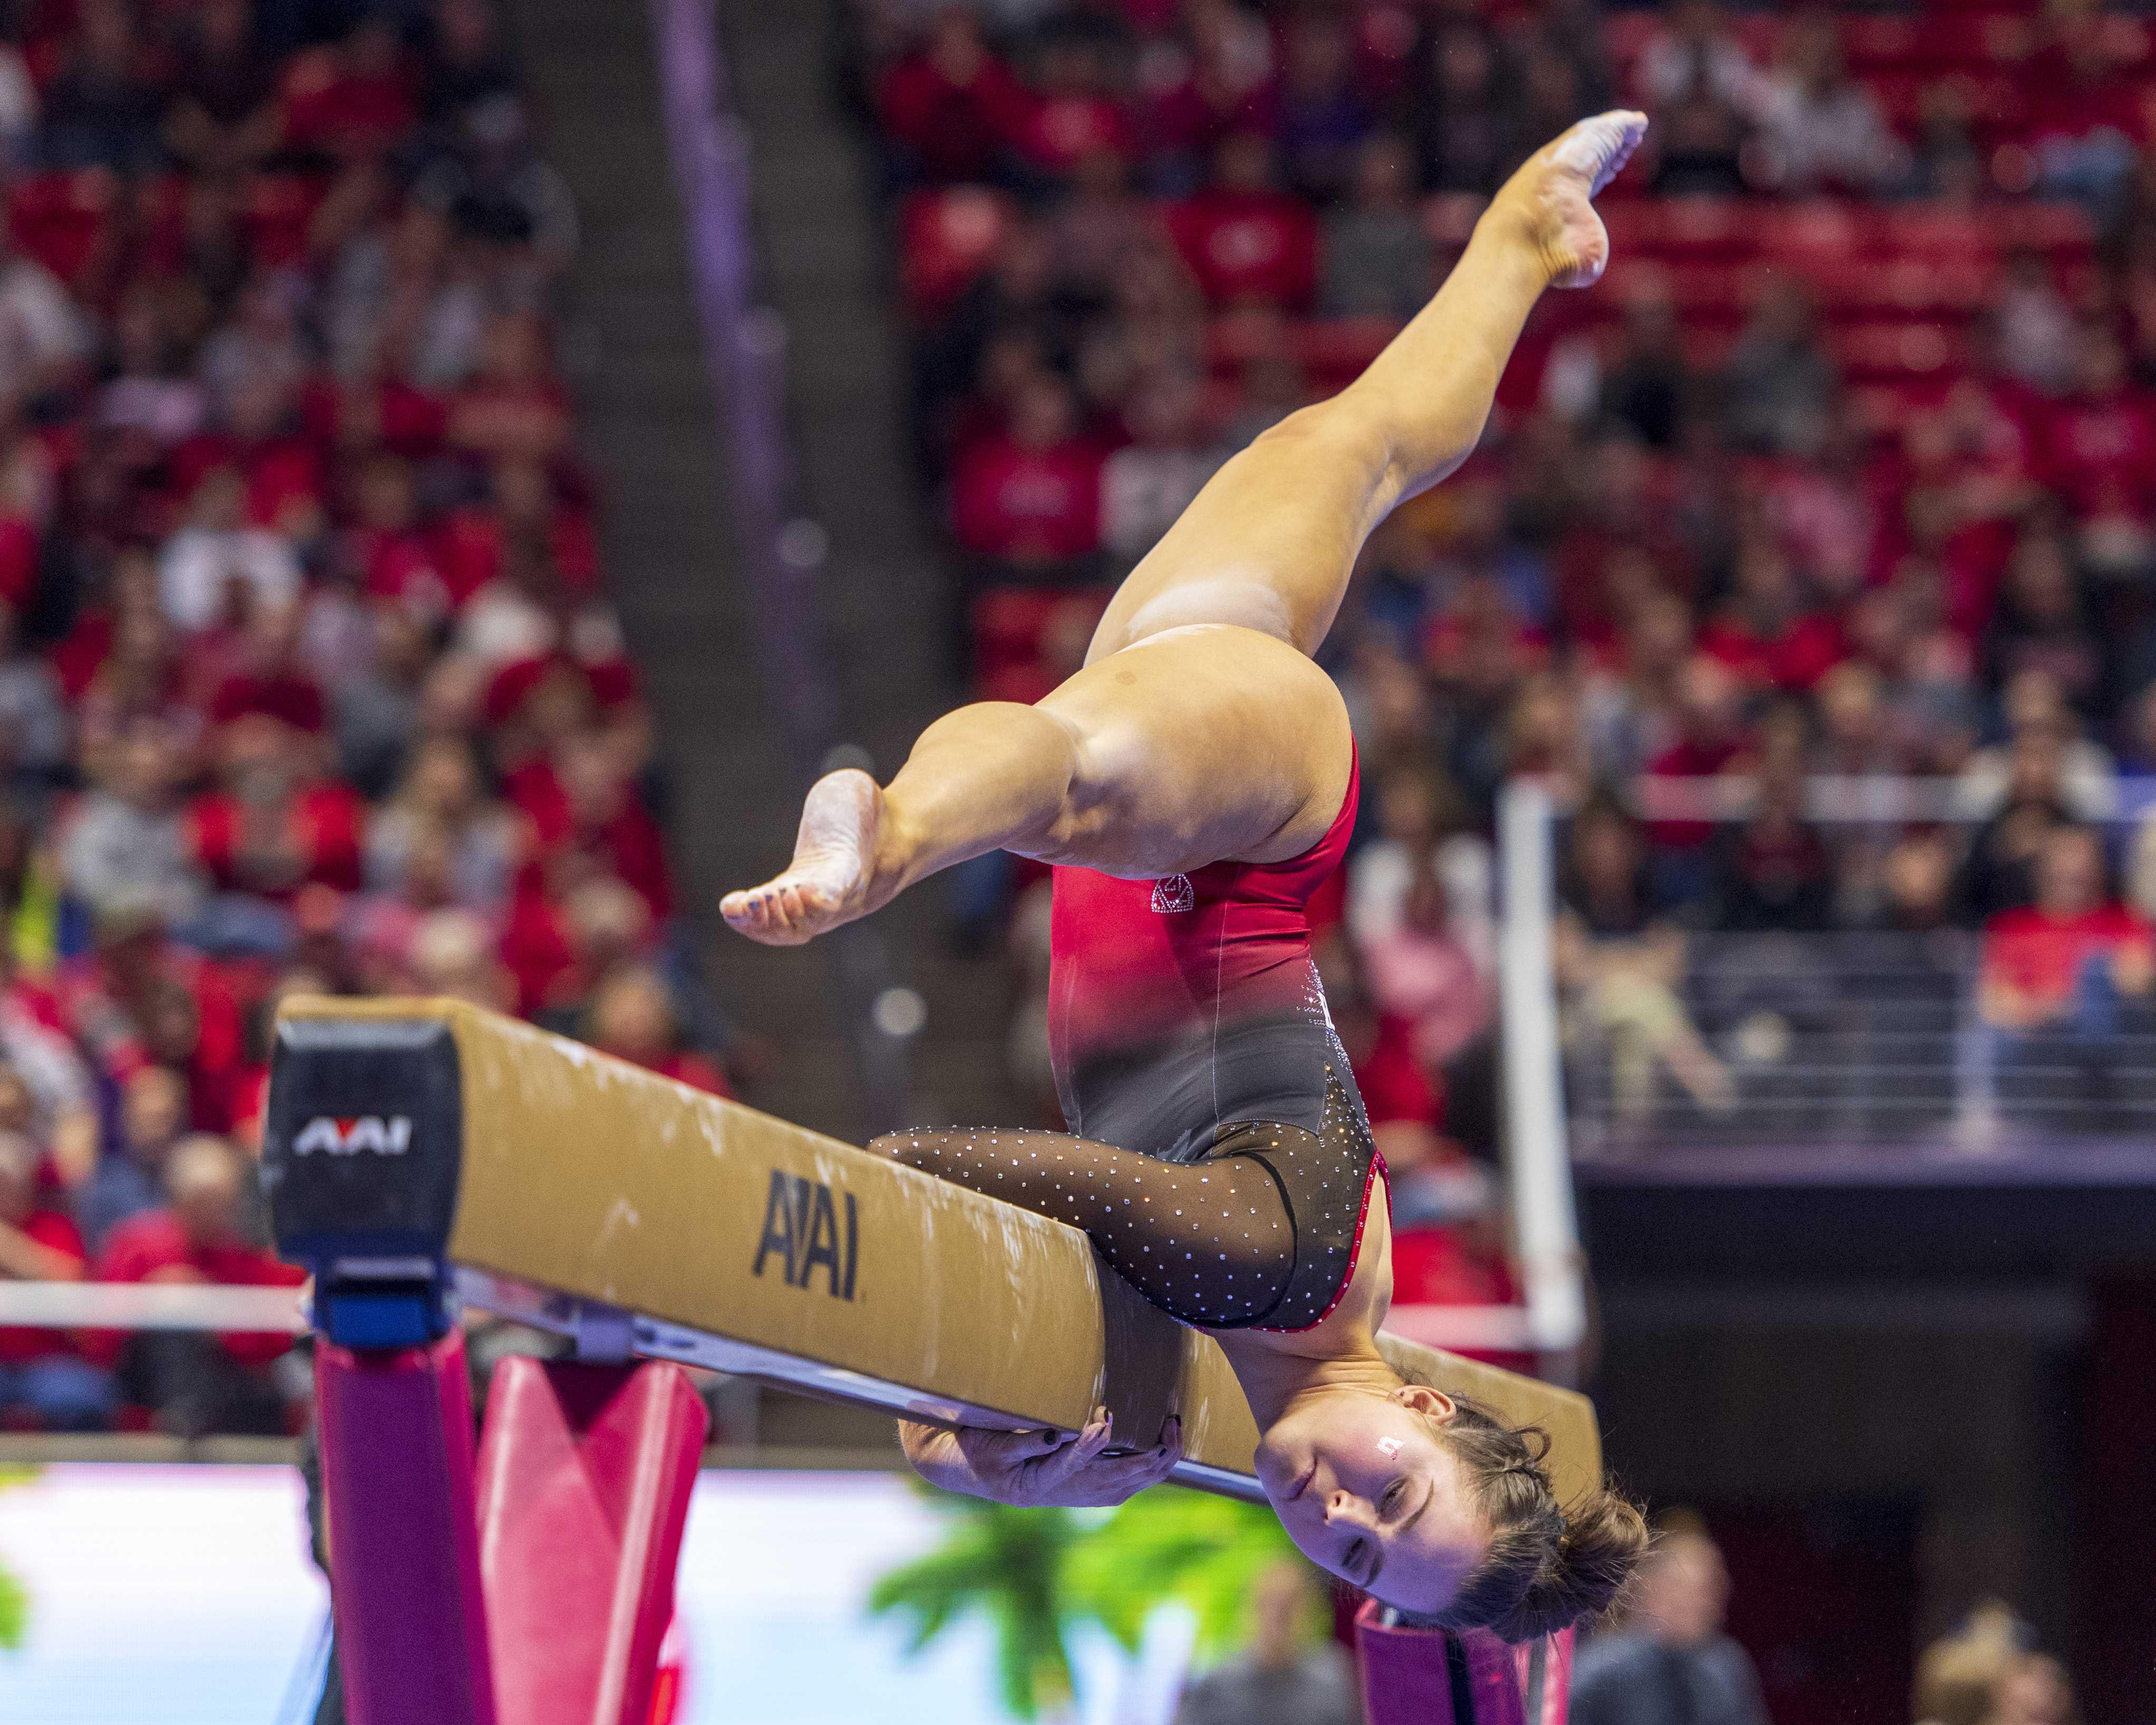 University of Utah women's gymnastics freshman Adrienne Randall performs on the balance beam in a dual meet vs. Penn State at the Jon M. Huntsman Center in Salt Lake City, Utah on Saturday, Jan. 5, 2019.  (Photo by Kiffer Creveling | The Daily Utah Chronicle)